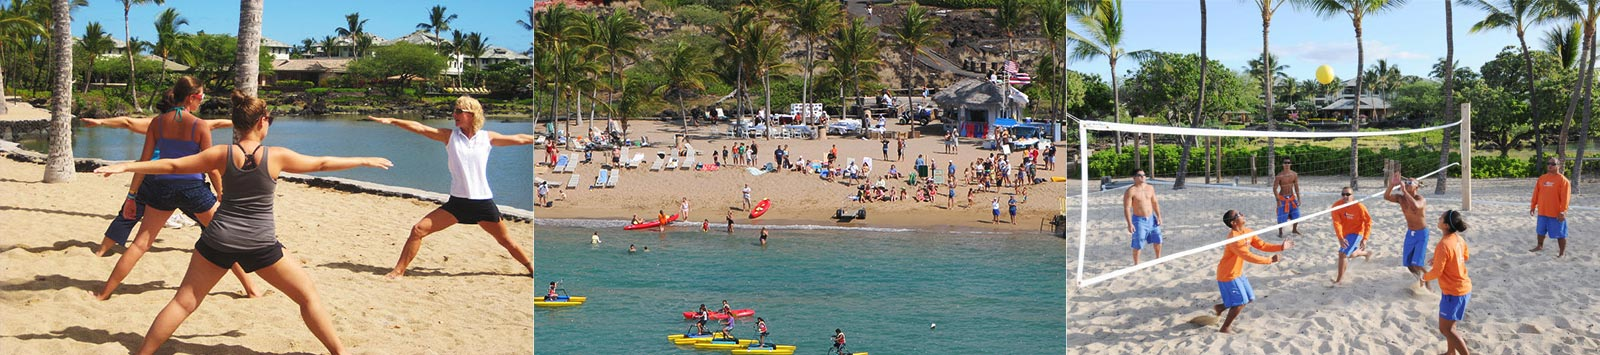 Beach Activities - Hawaii Ocean Sports